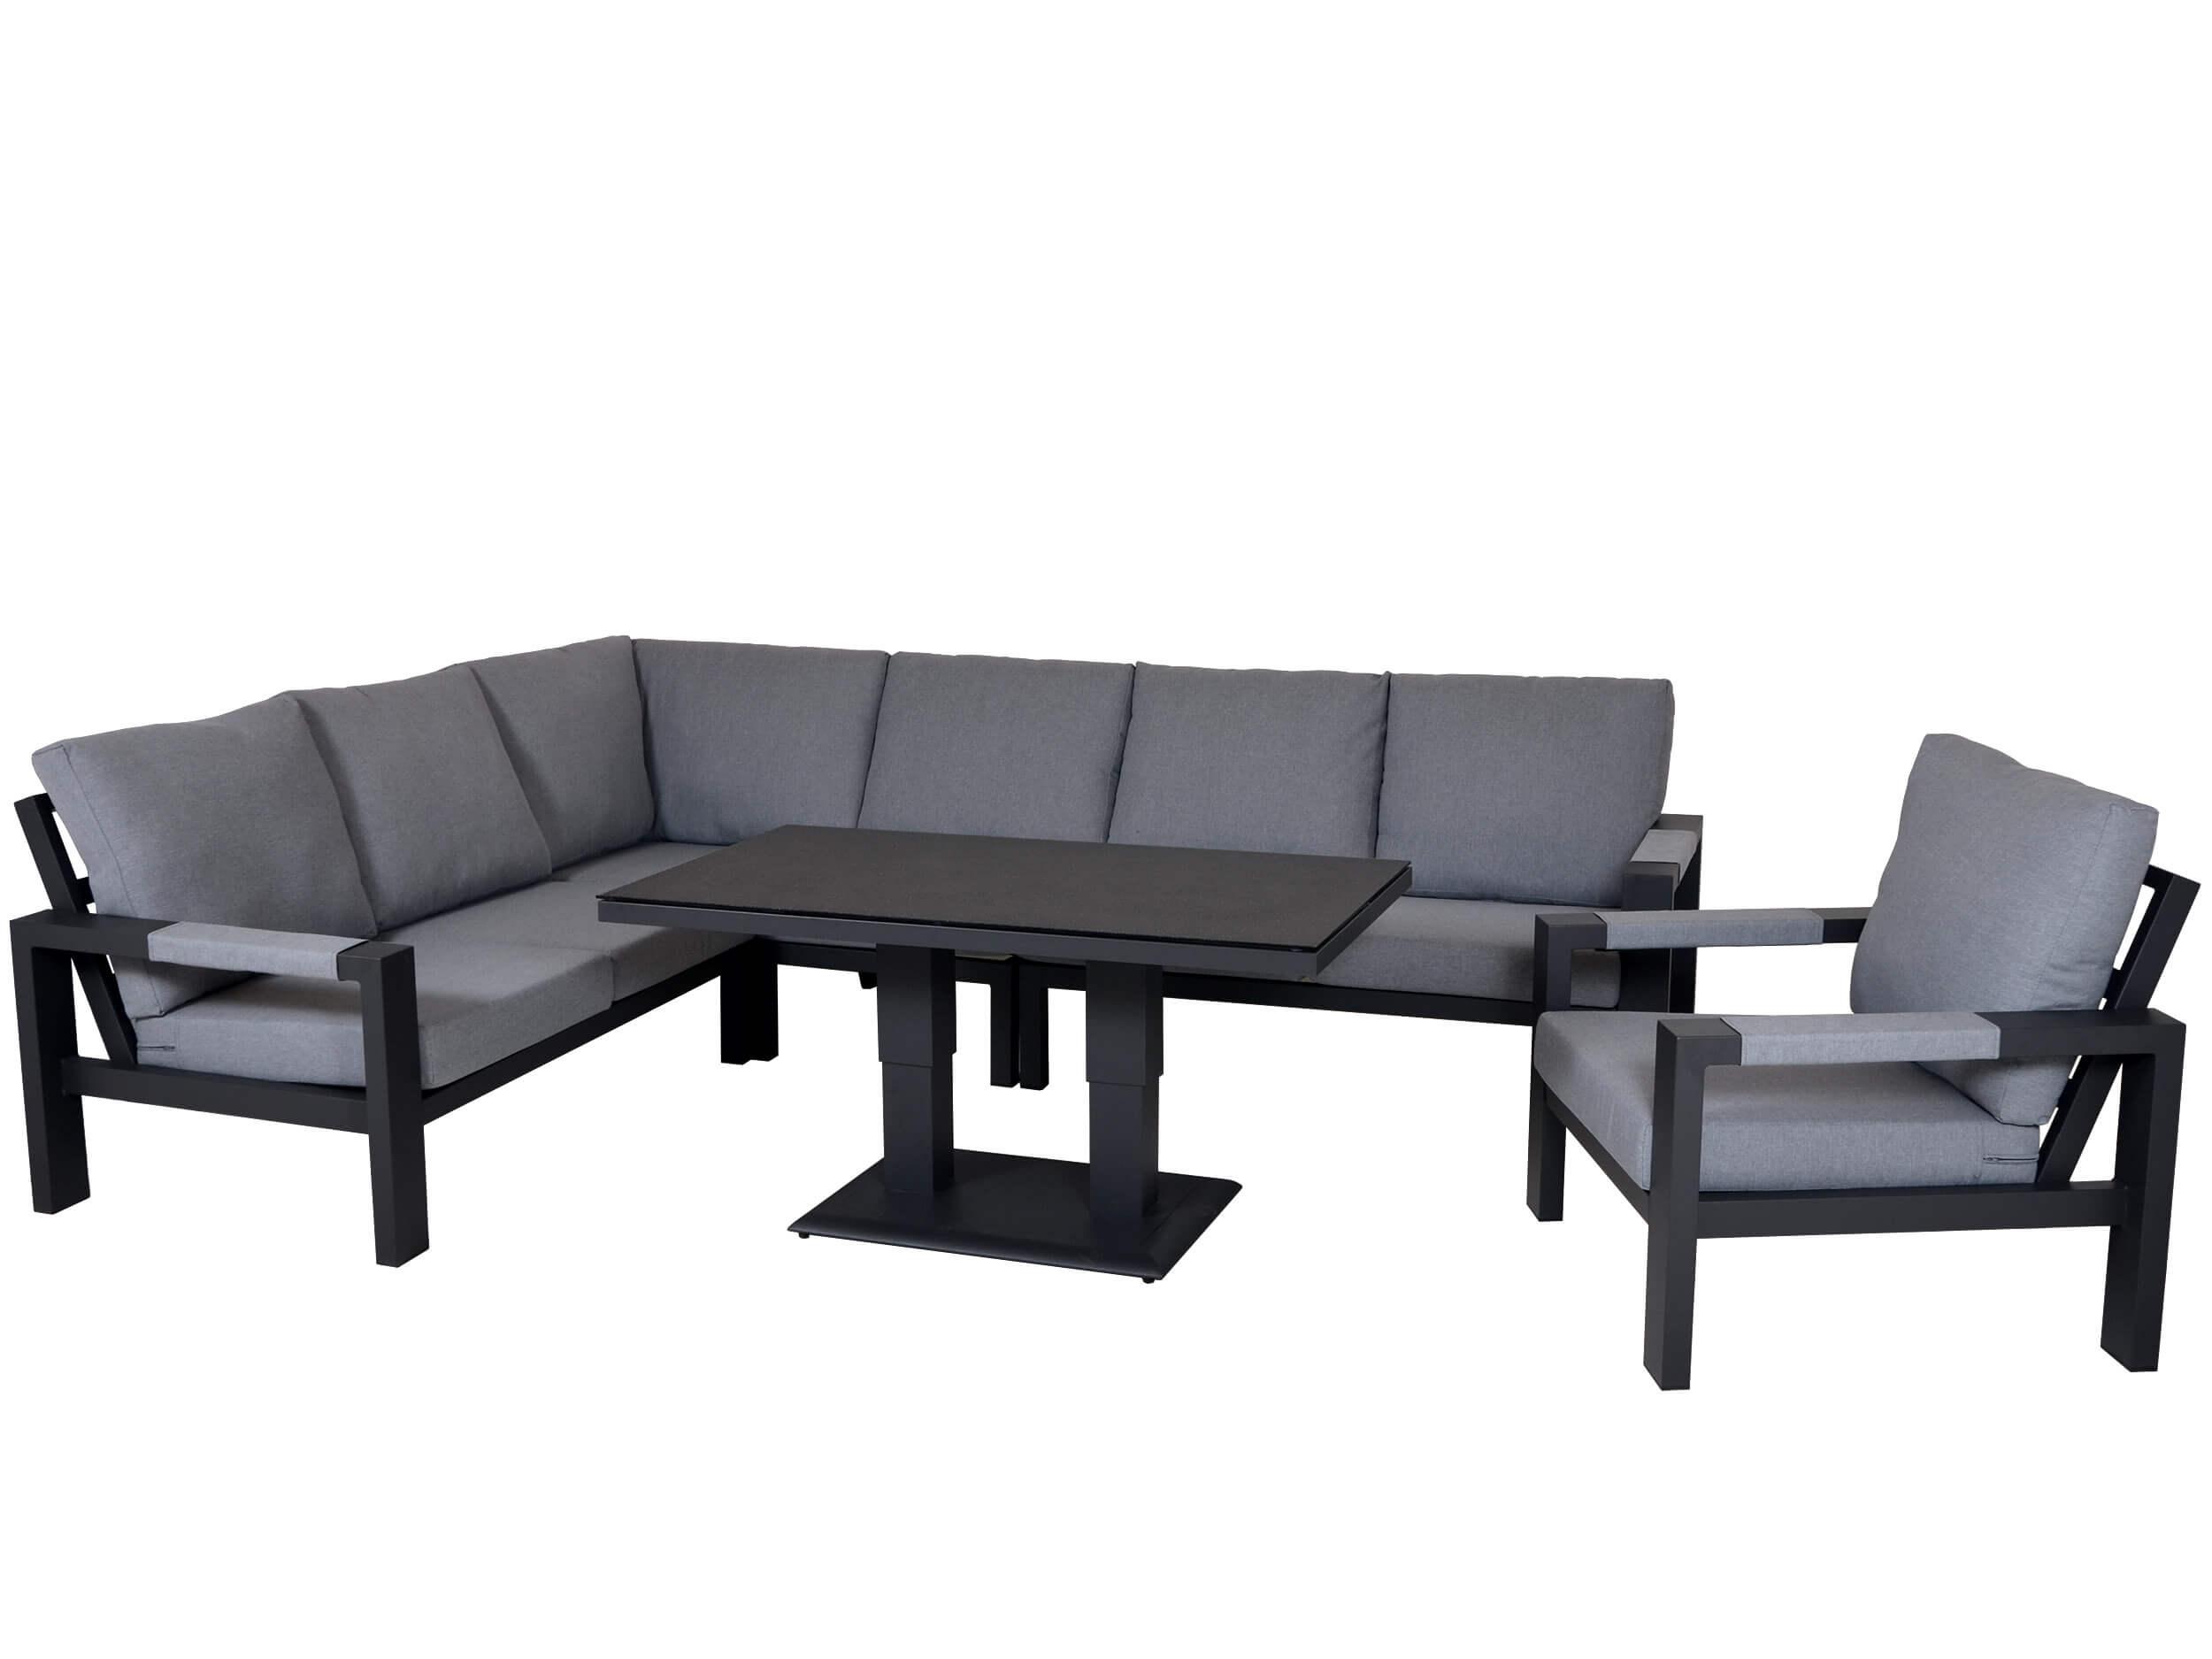 loungegruppen loungesets f r den garten gartenm bel l nse. Black Bedroom Furniture Sets. Home Design Ideas